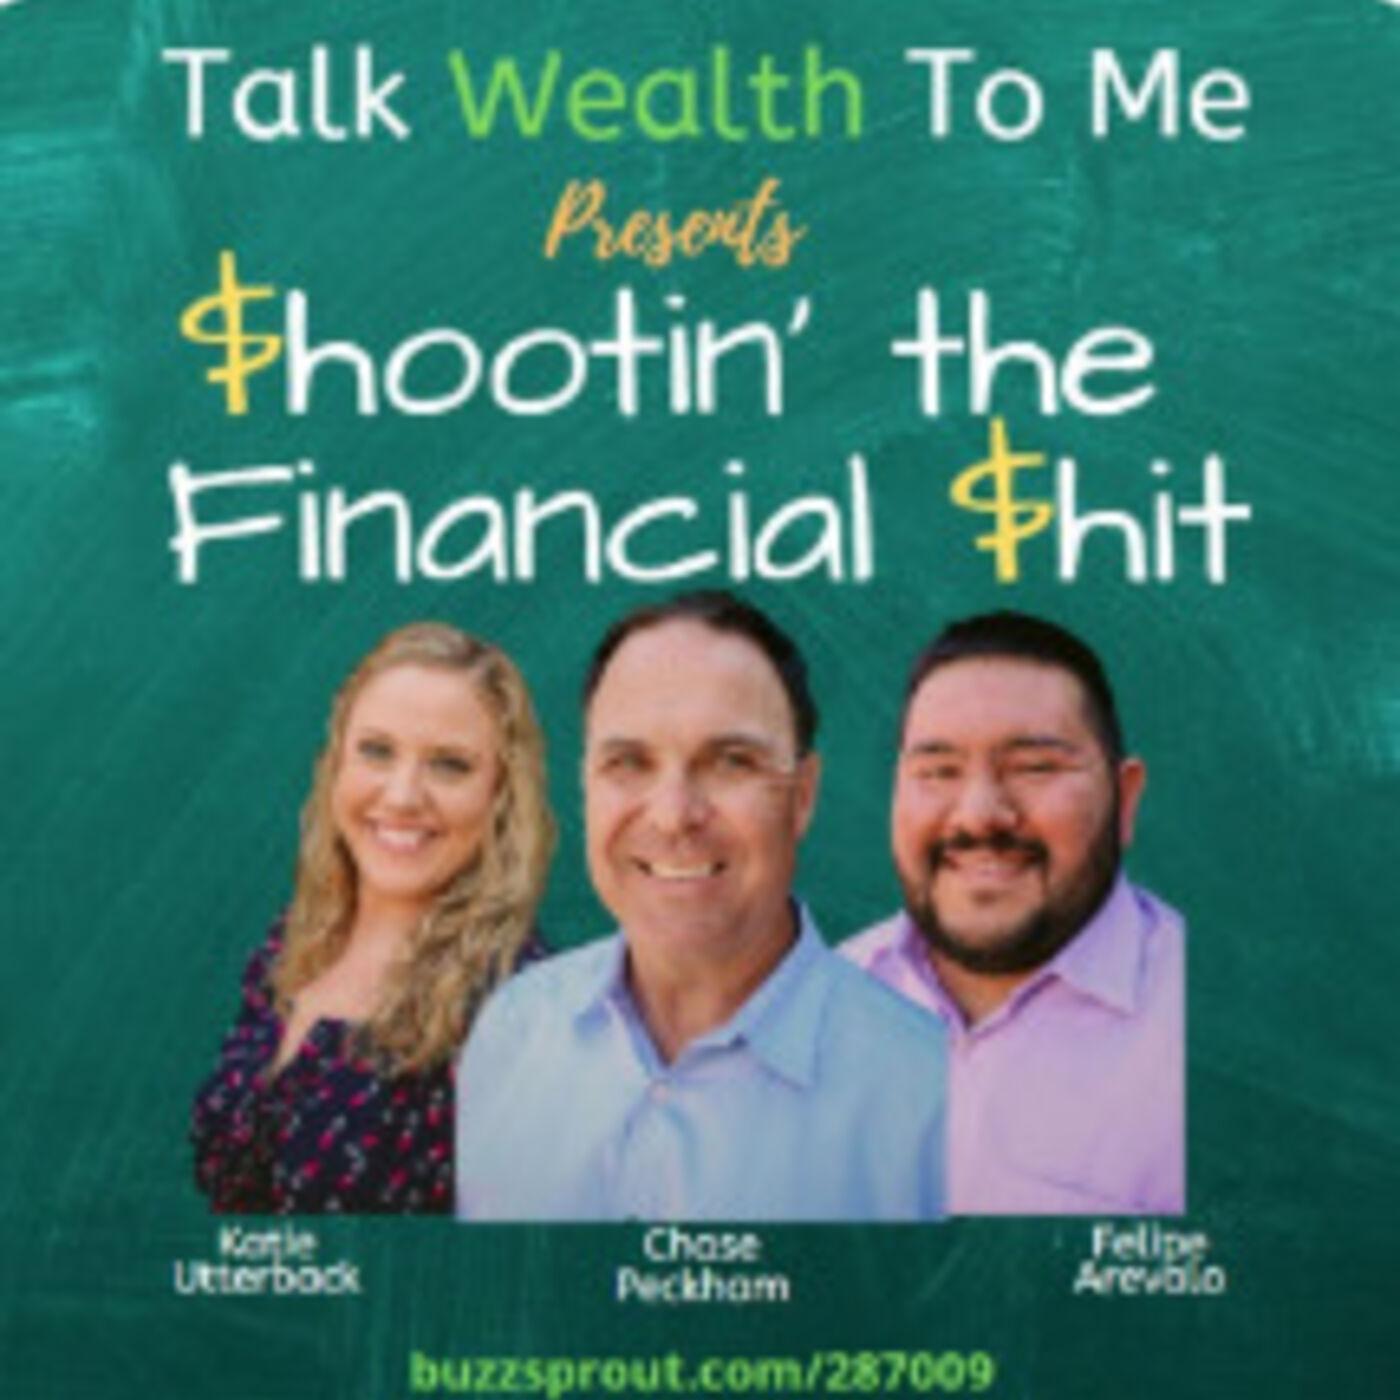 #066 Shootin the Financial $h%! - Flipping the Script